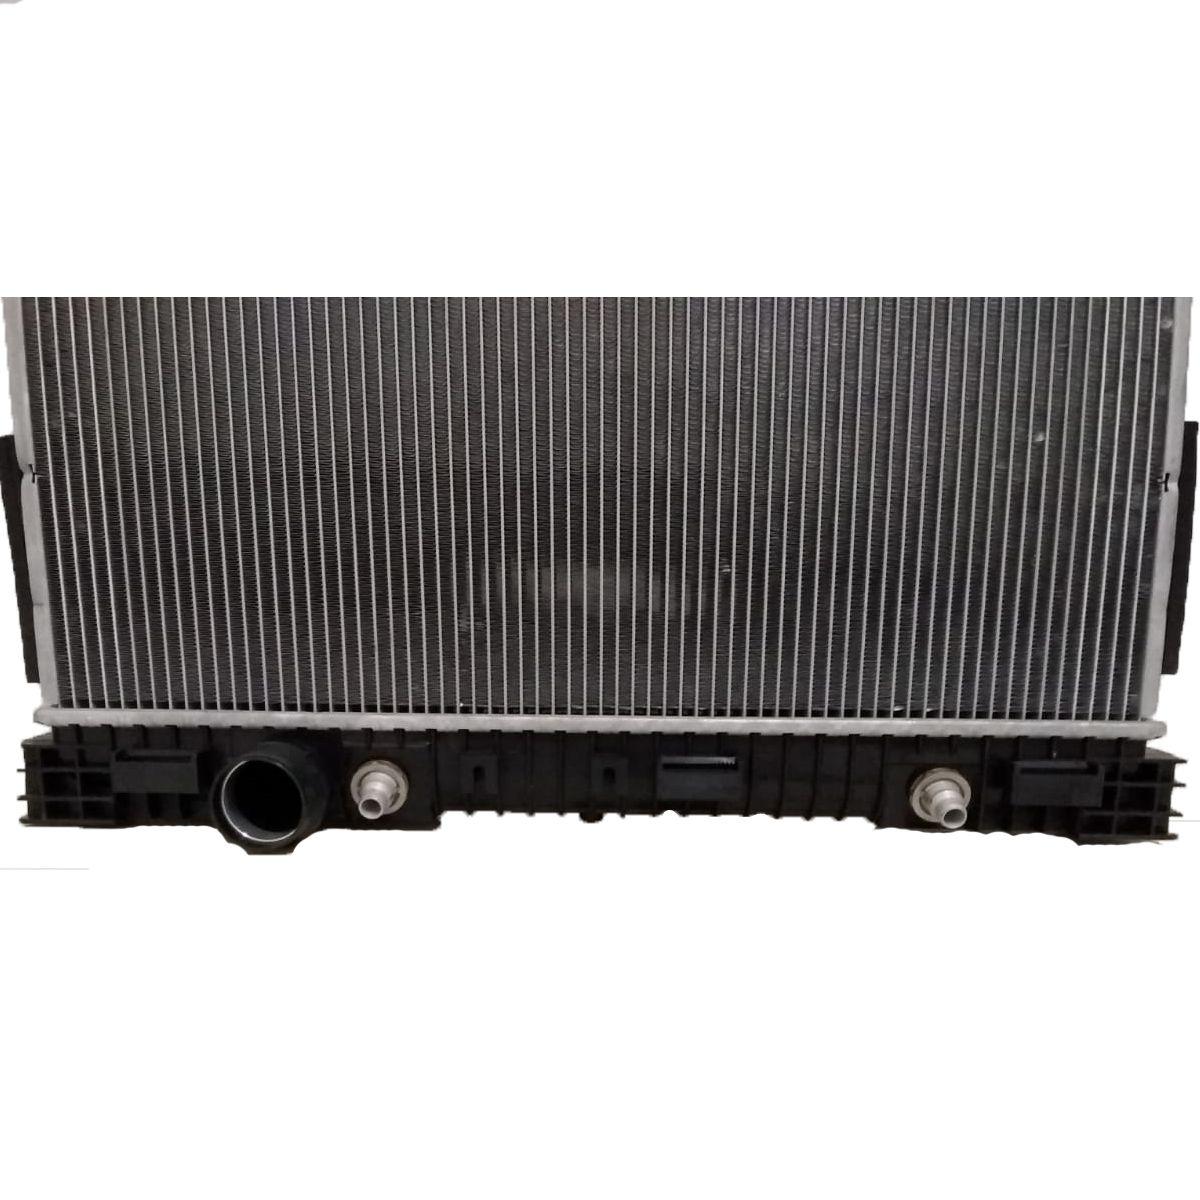 Radiador Mercedes Axor 2540 401CV Diesel 2005 a 2011